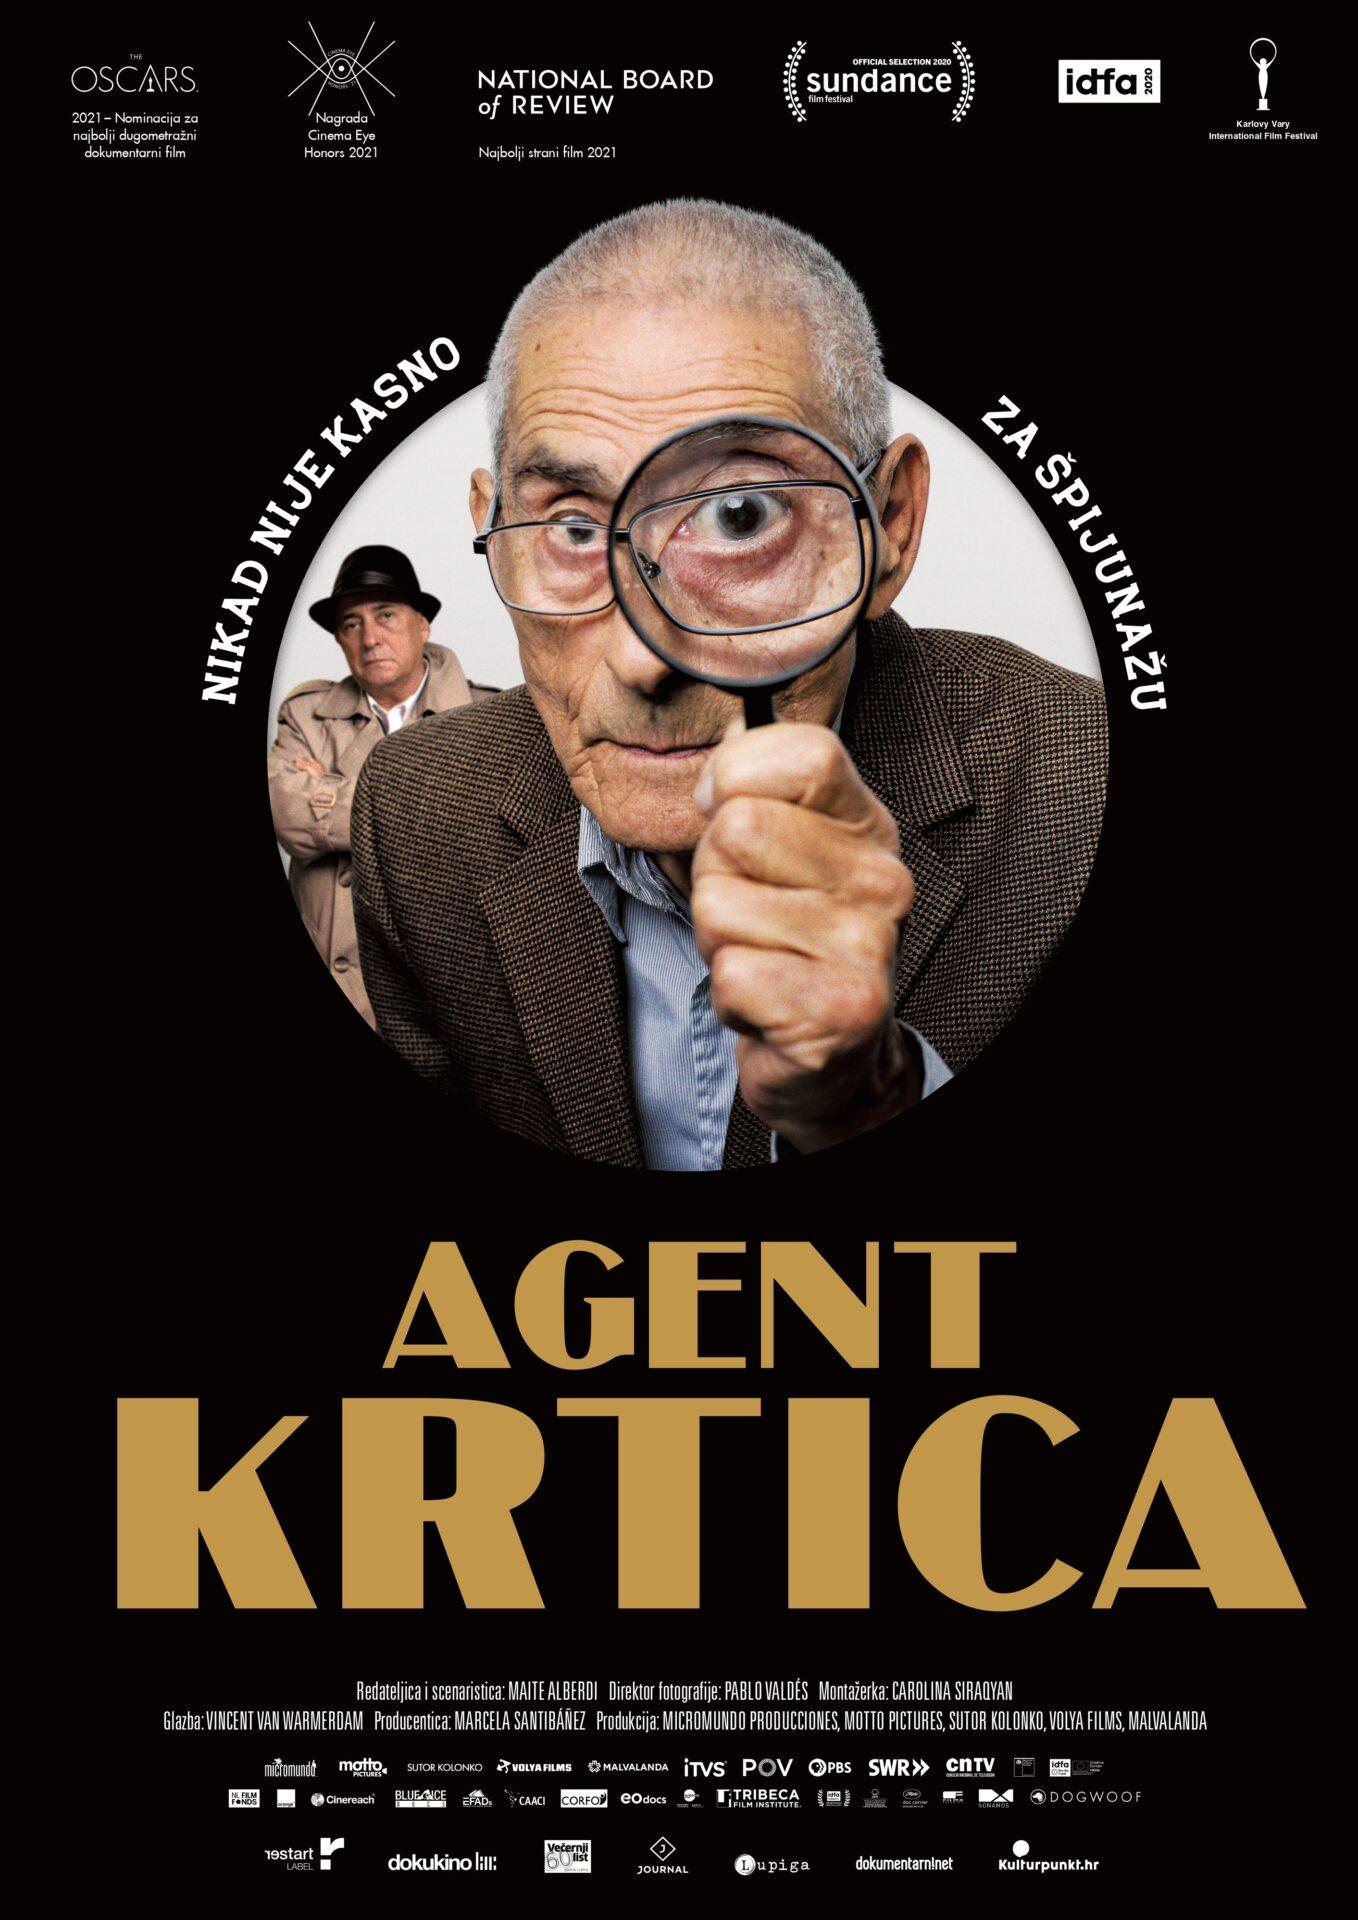 Agent Krtica